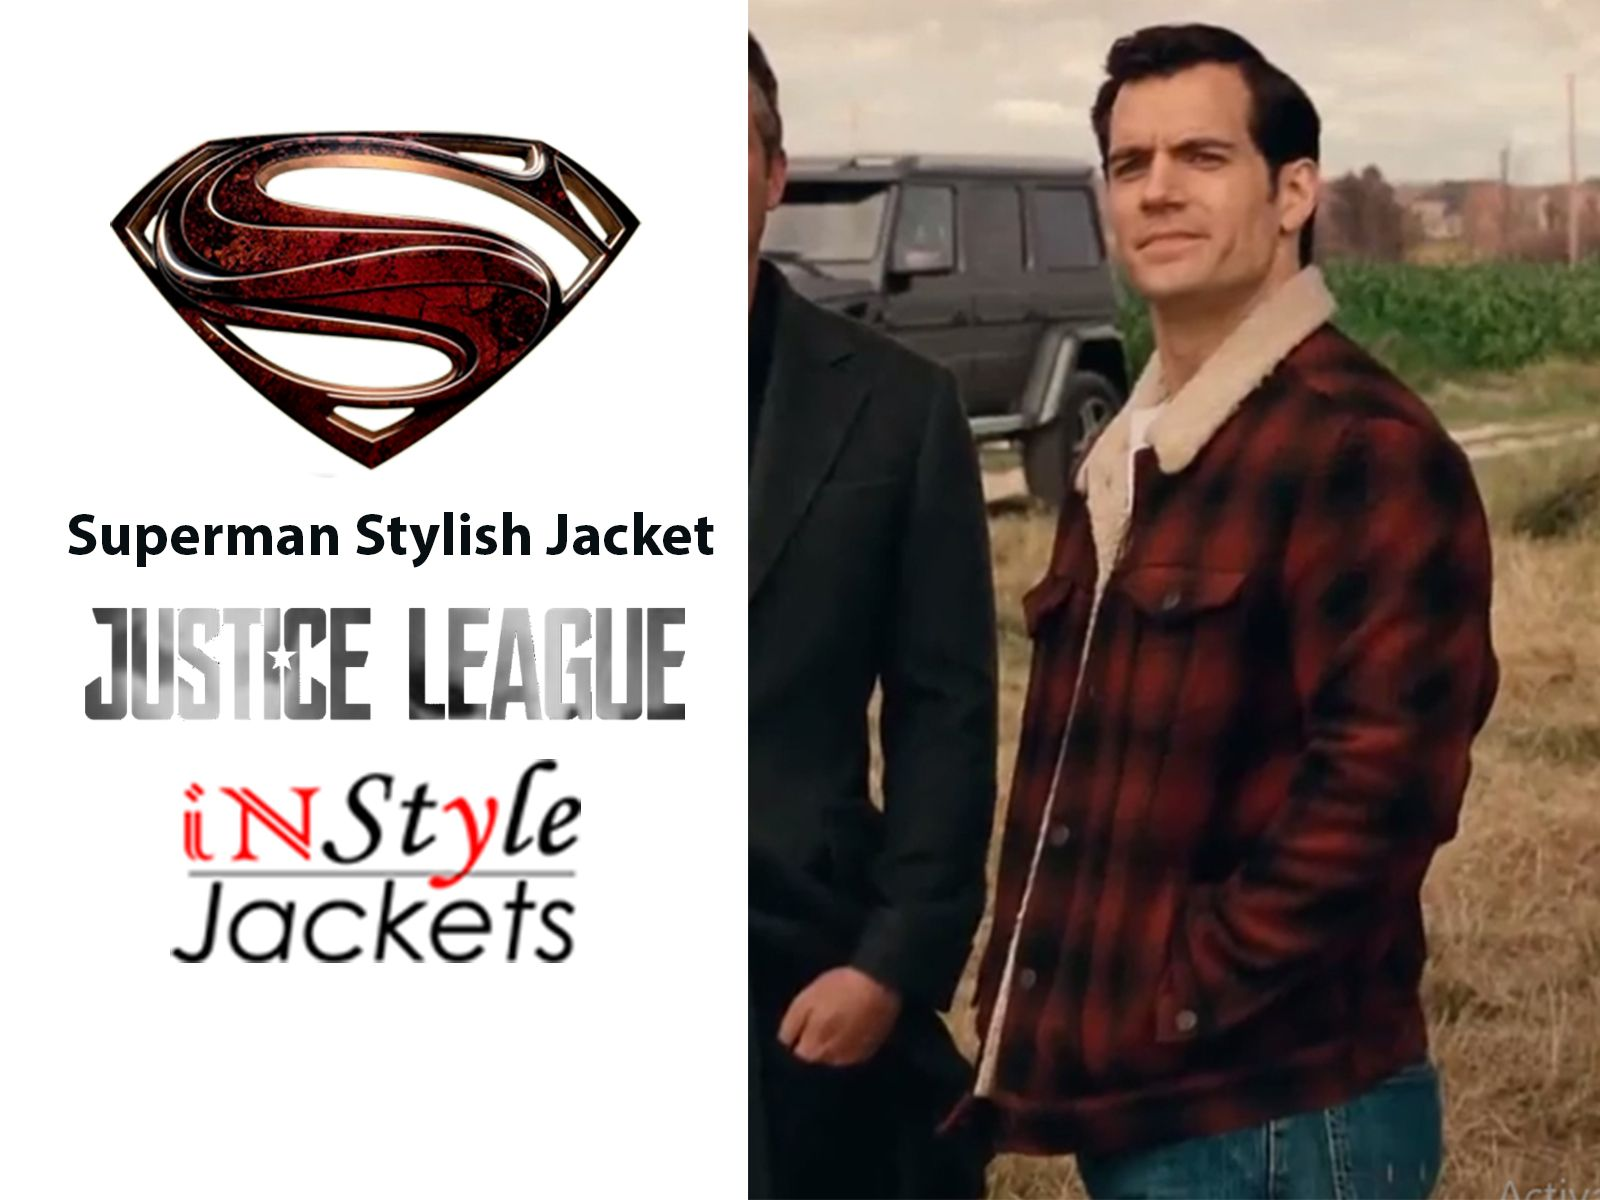 Superman Justice League Stylish Jacket Justice league